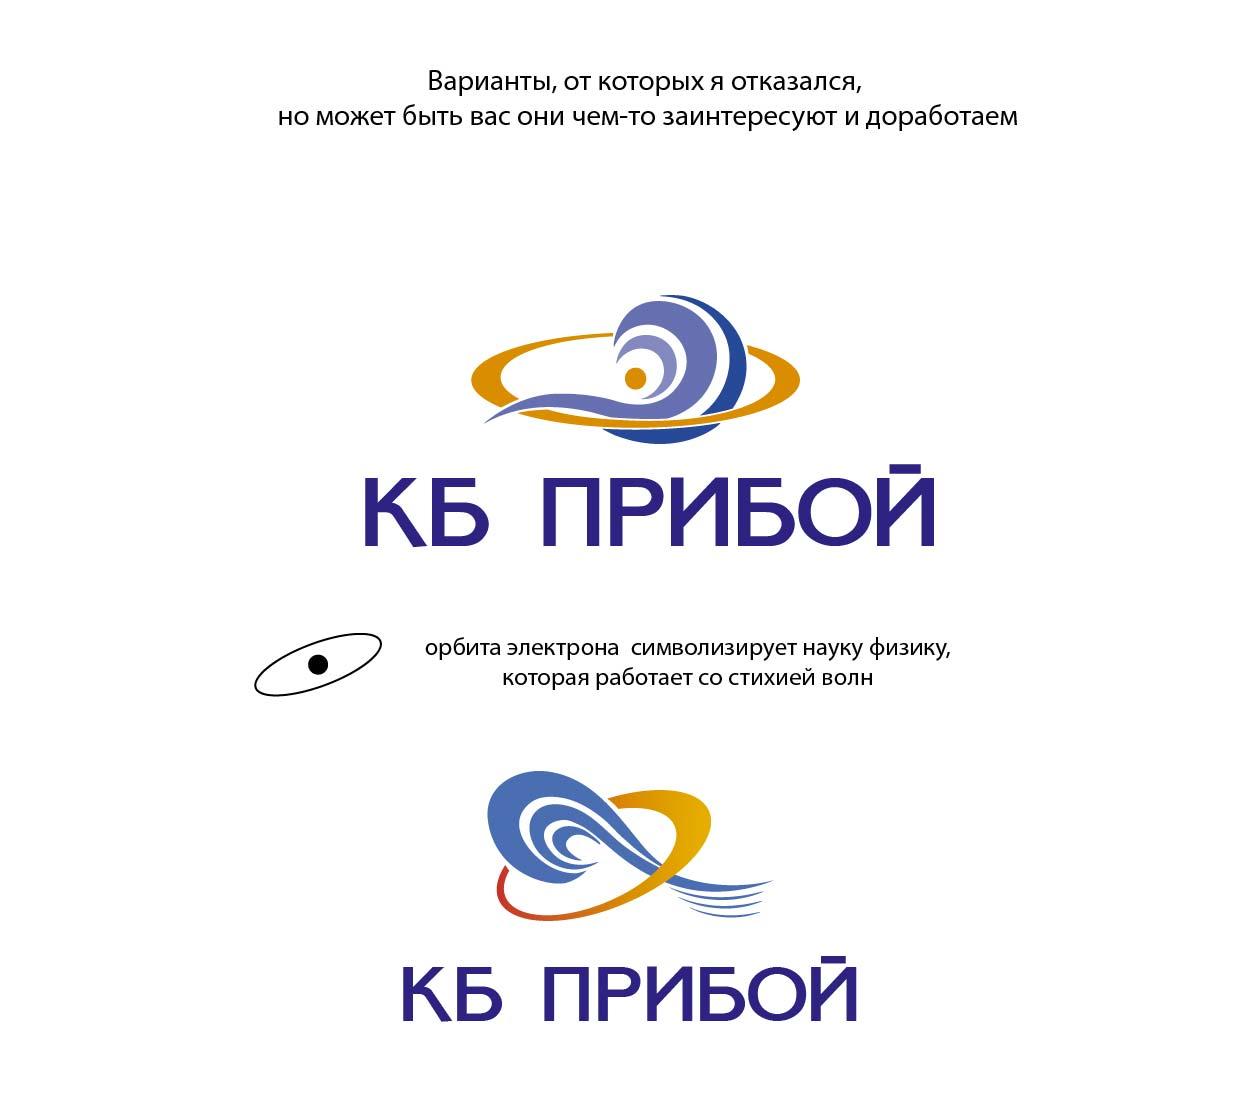 Разработка логотипа и фирменного стиля для КБ Прибой фото f_8405b277c88cb652.jpg